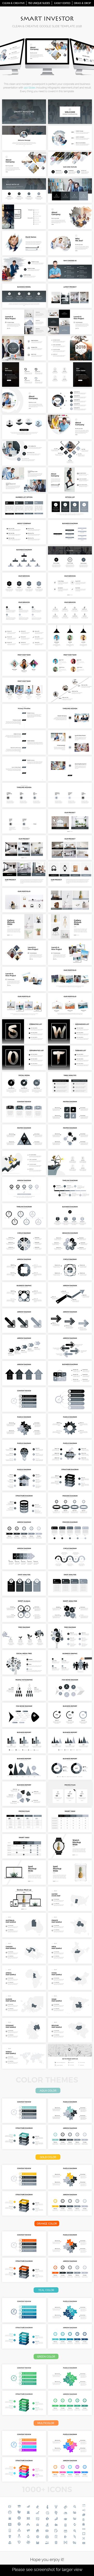 Smart Investor - Efffective Google Slide Template 2018 - Business PowerPoint Templates